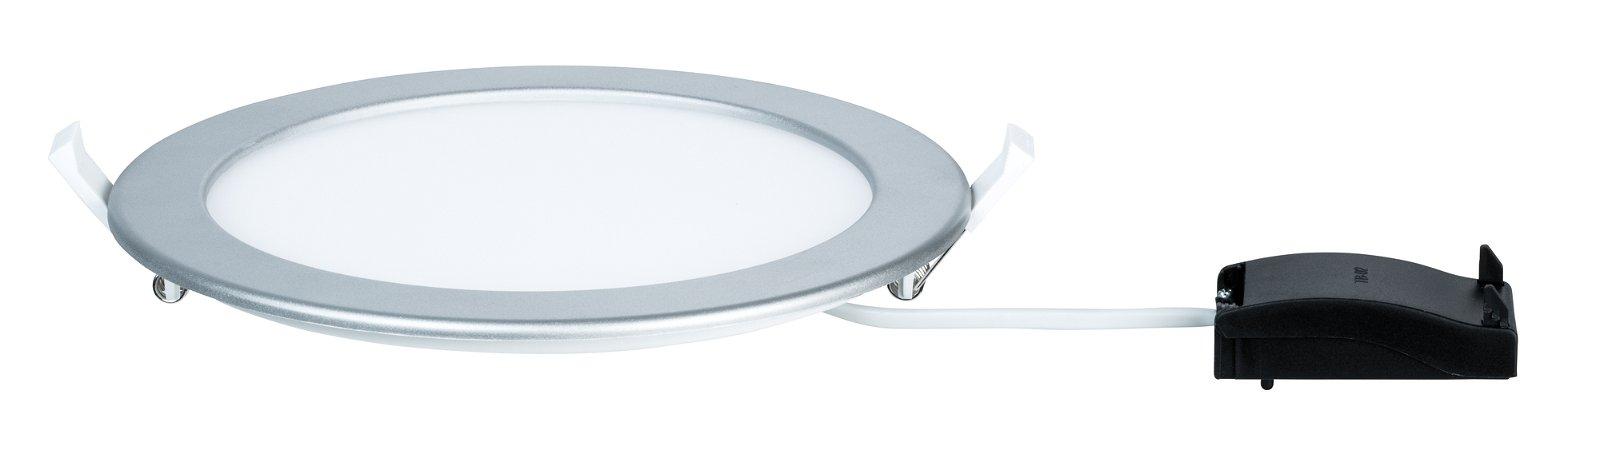 LED Einbaupanel IP44 rund 220mm 1724lm 2700K Chrom matt